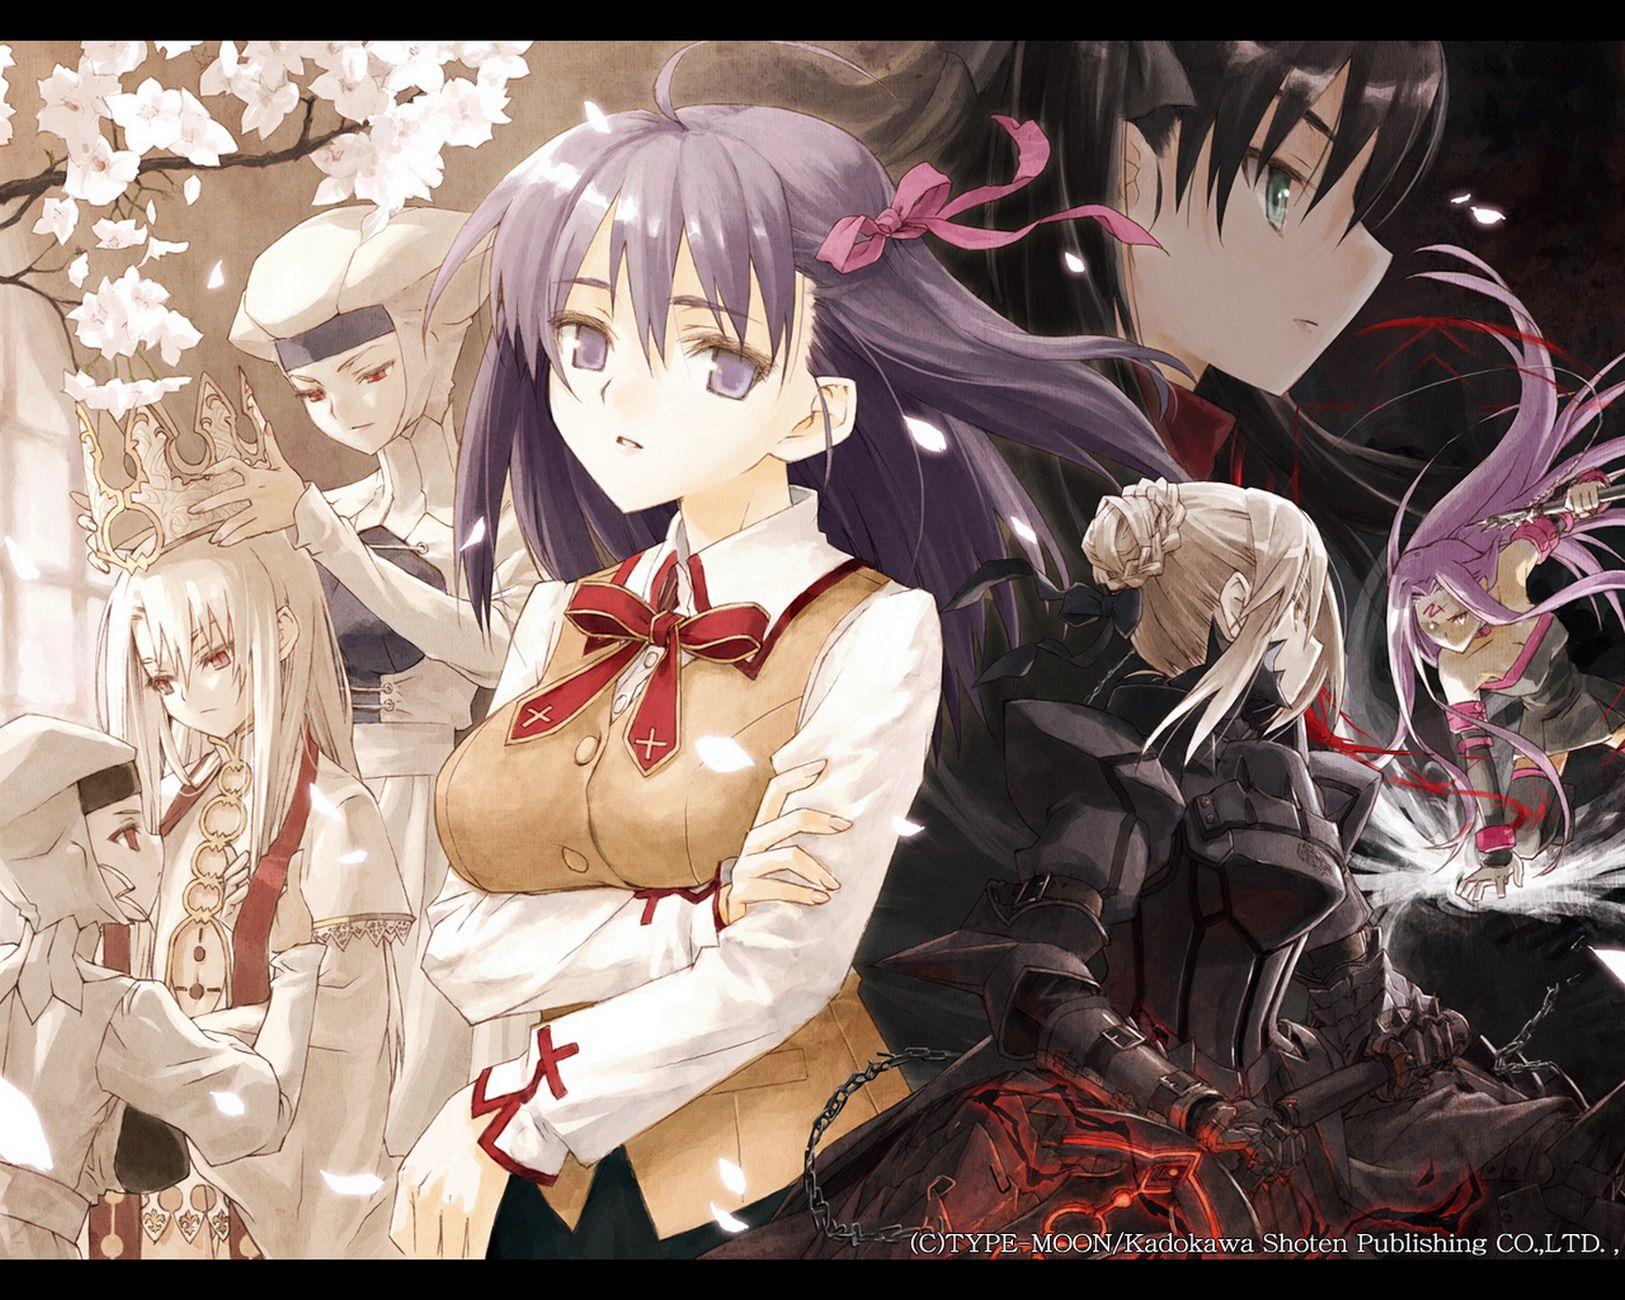 Minitokyo_Fate-Stay_Night_Scans_368455.jpg